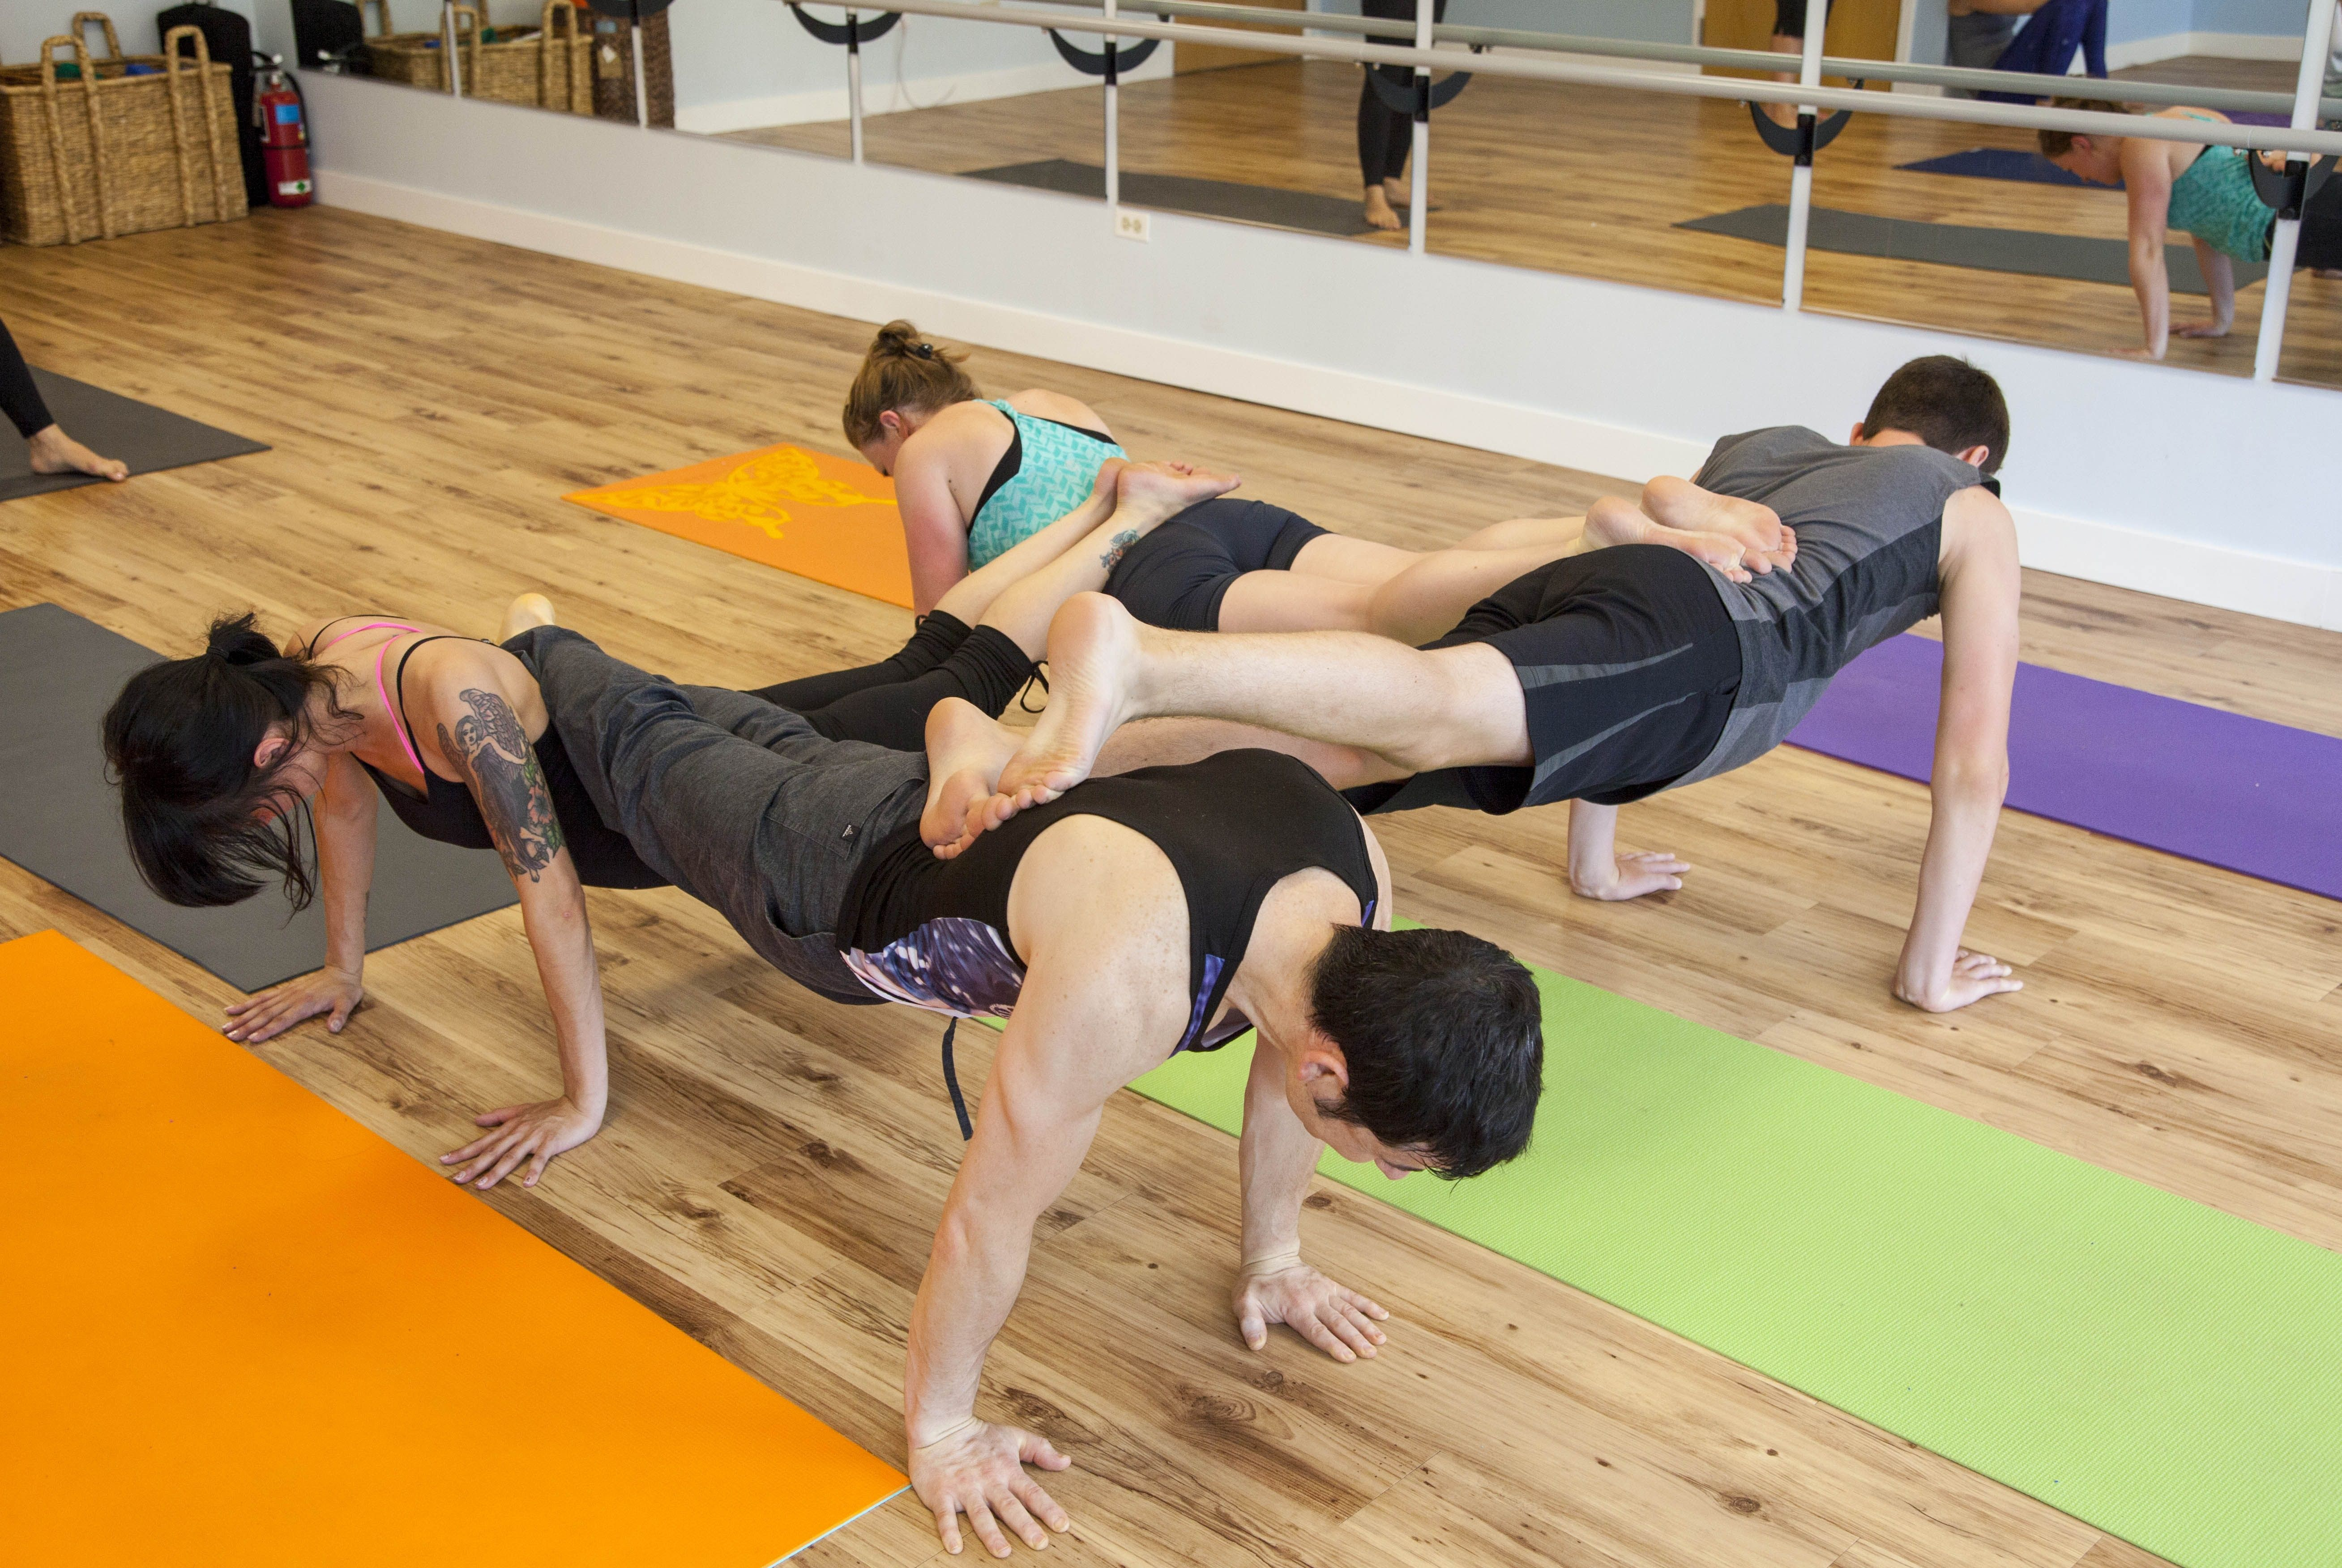 4 Person Pushup Jpg 5232 3504 Yoga Challenge Poses Yoga Poses Two People Yoga Poses